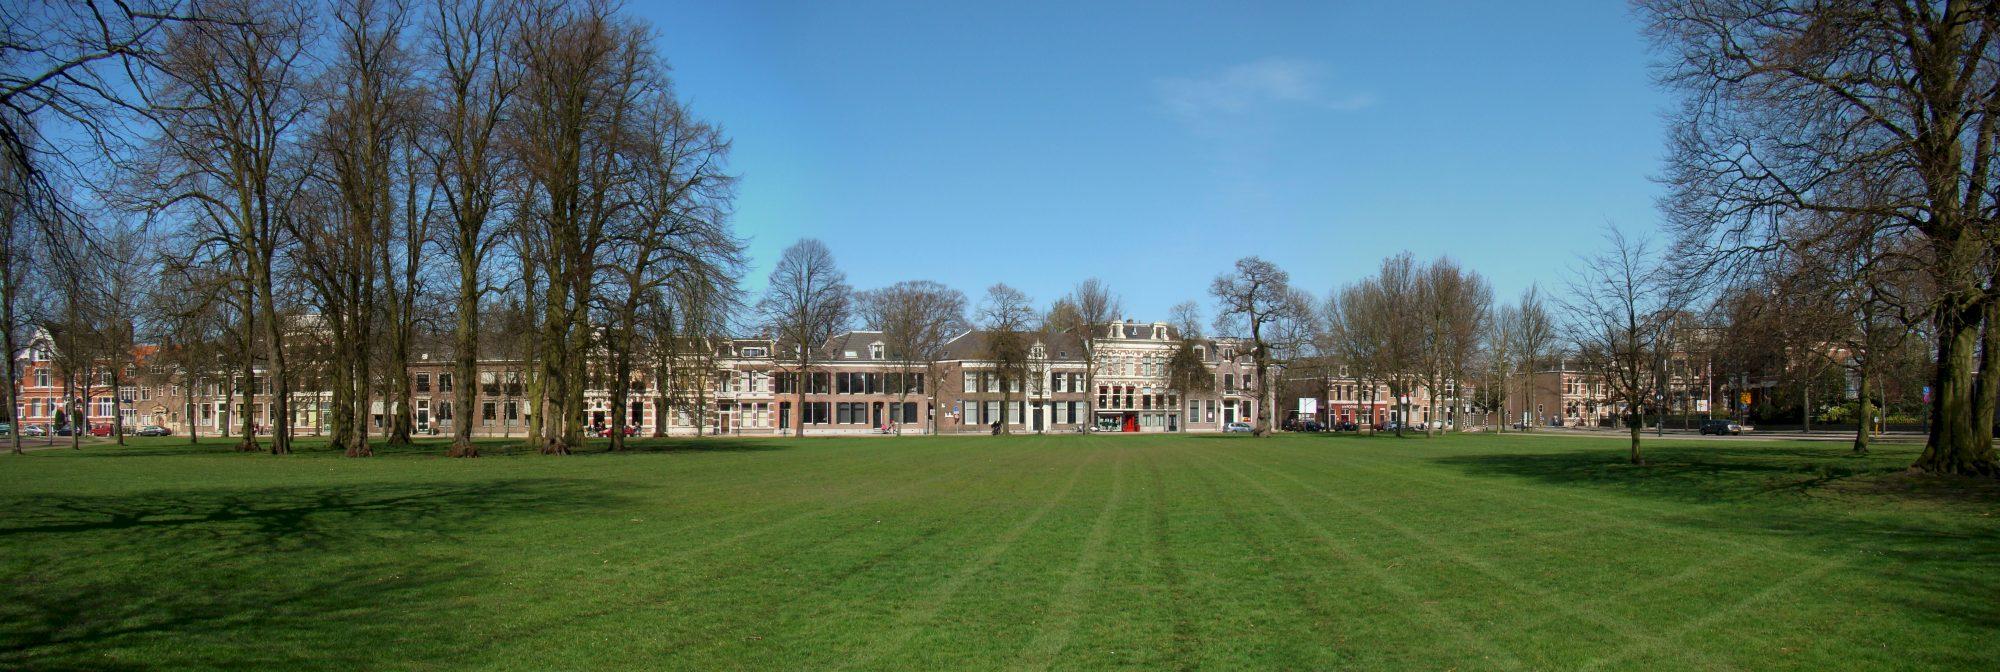 AVT Benelux gevestigd aan het Florapark in Haarlem